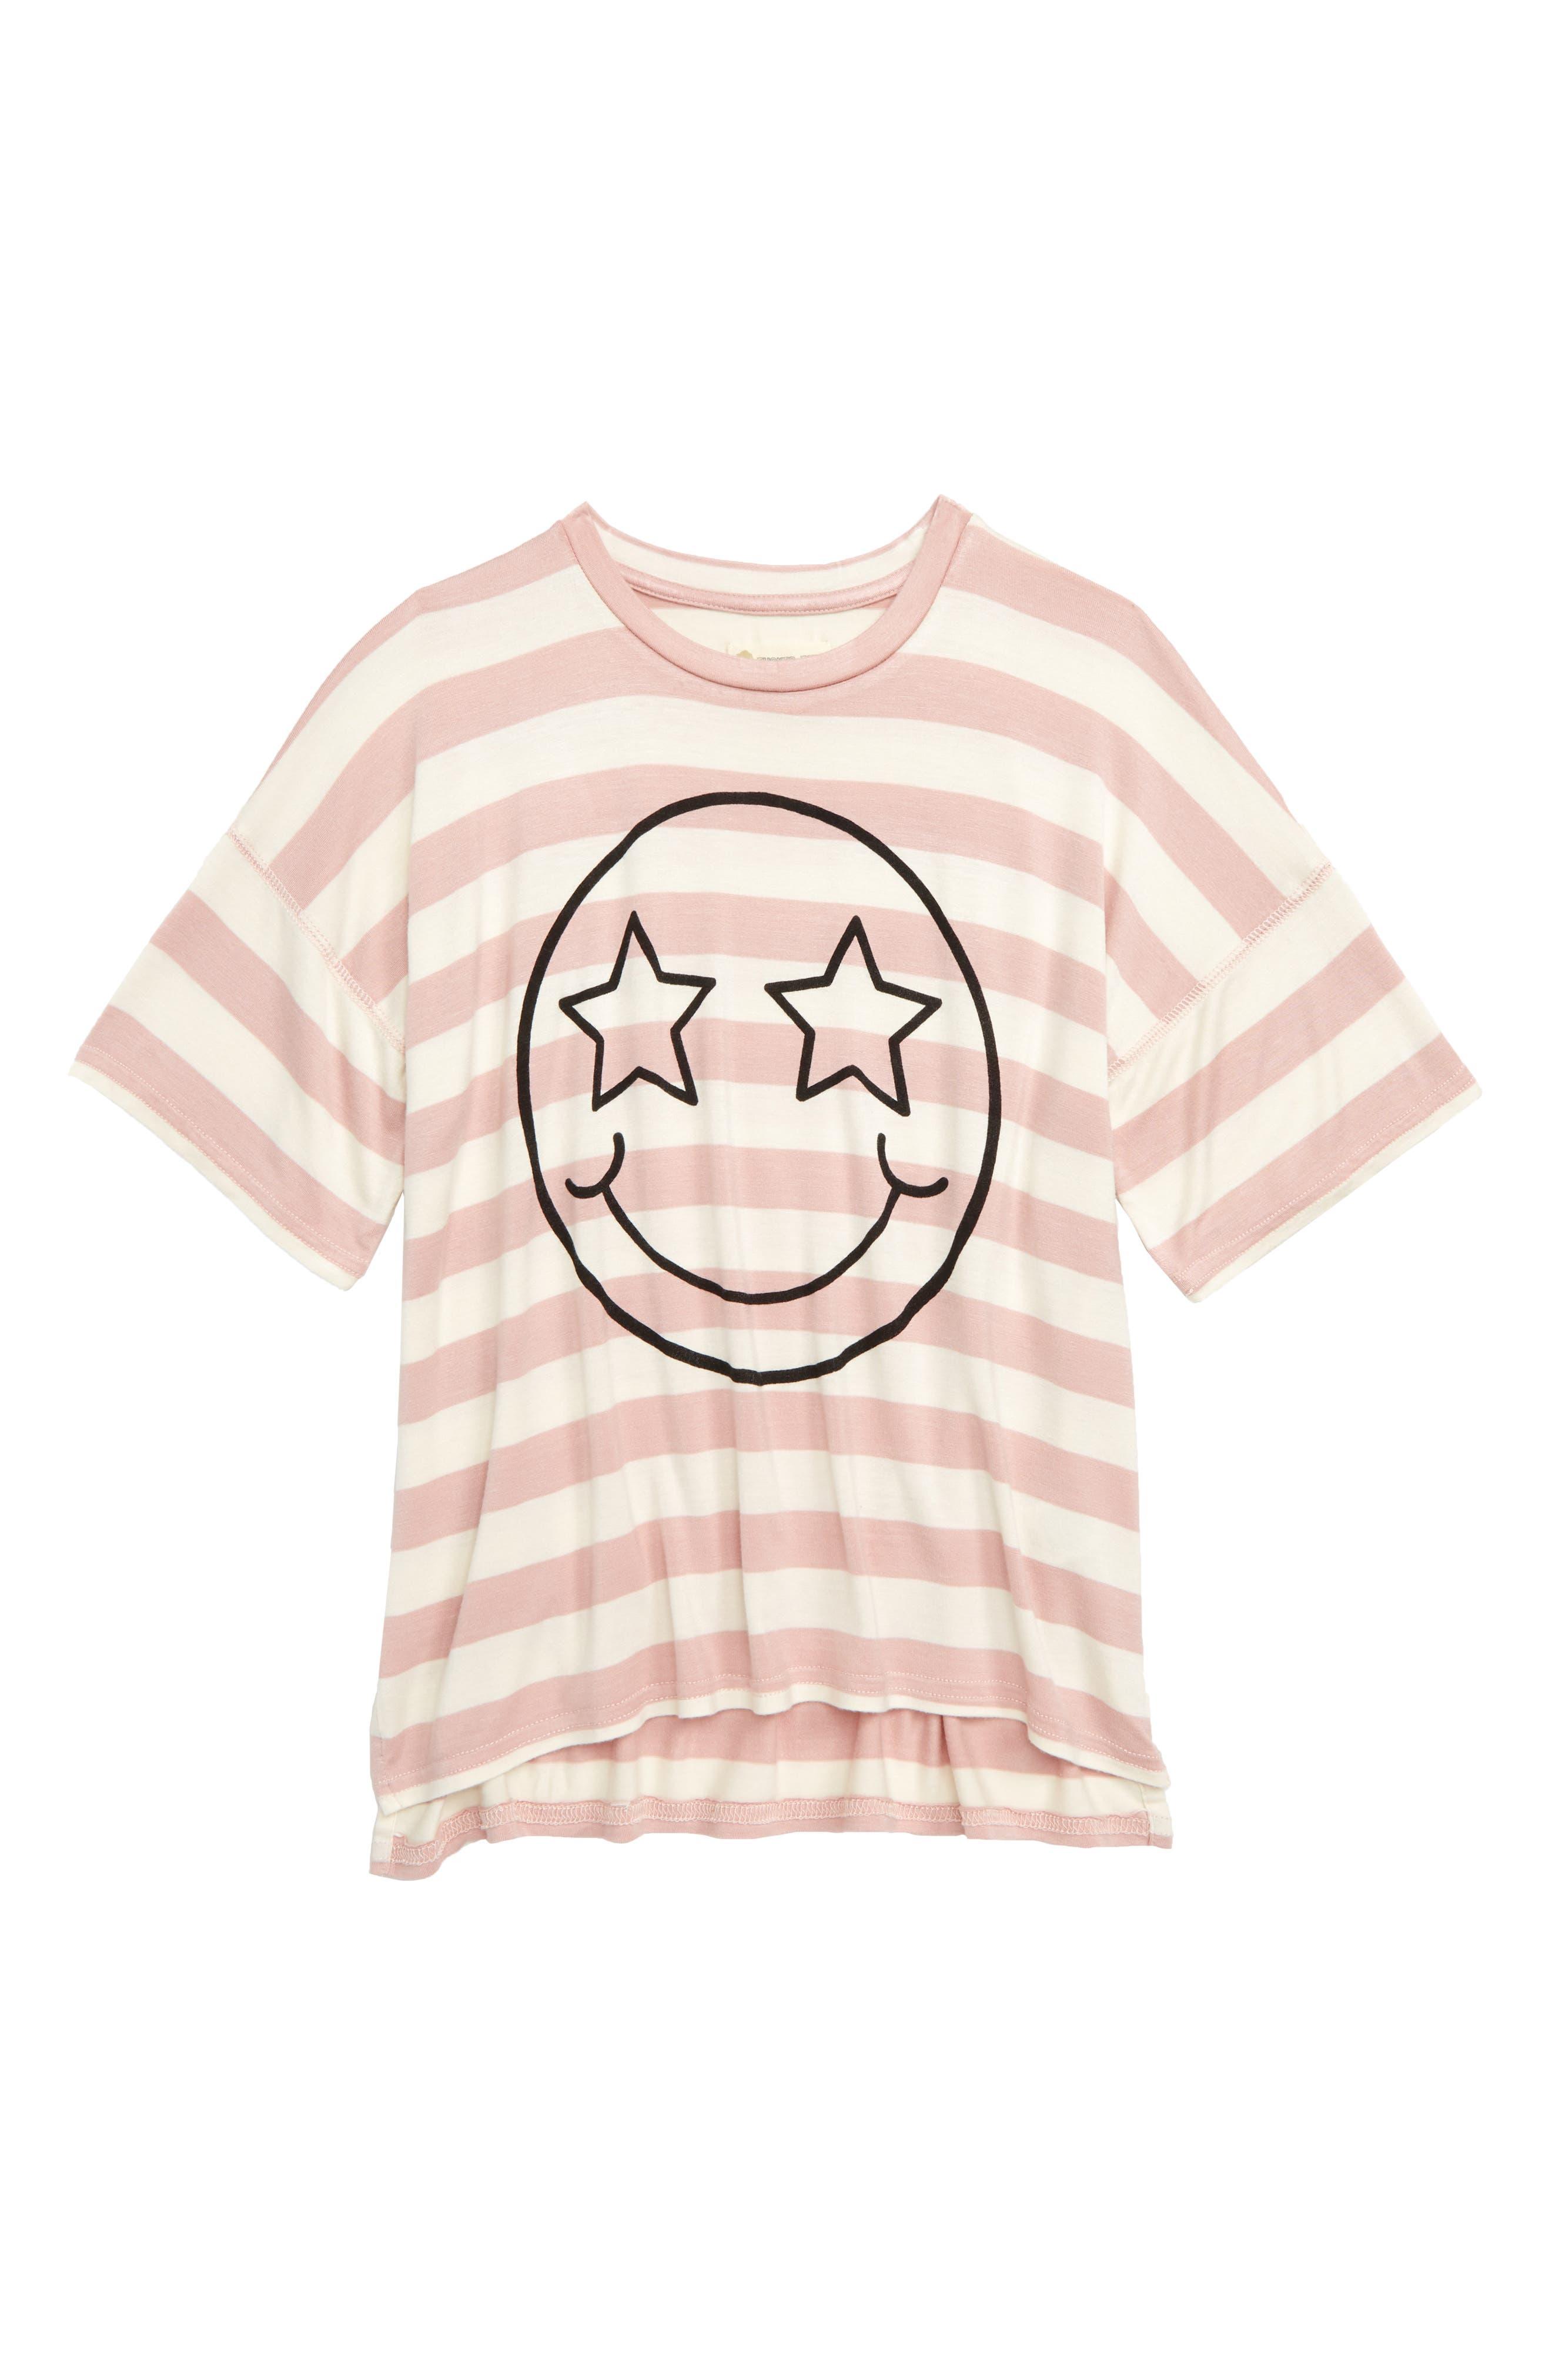 Smiley Star Tee,                             Main thumbnail 1, color,                             PINK PEACHSKIN SMILEY FACE